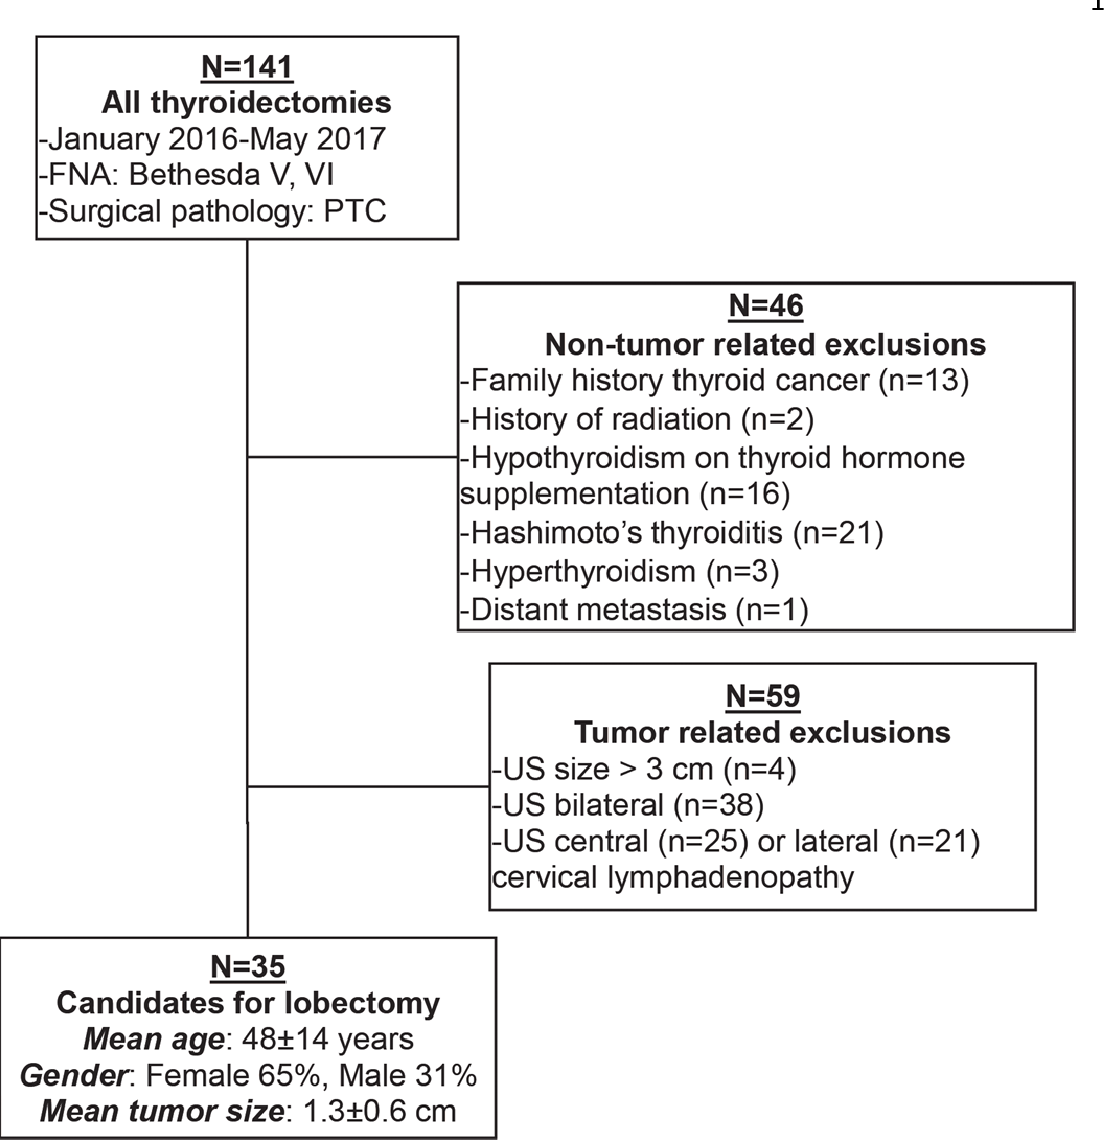 THYROIDECTOMY - Definiția și sinonimele thyroidectomy în dicționarul Engleză